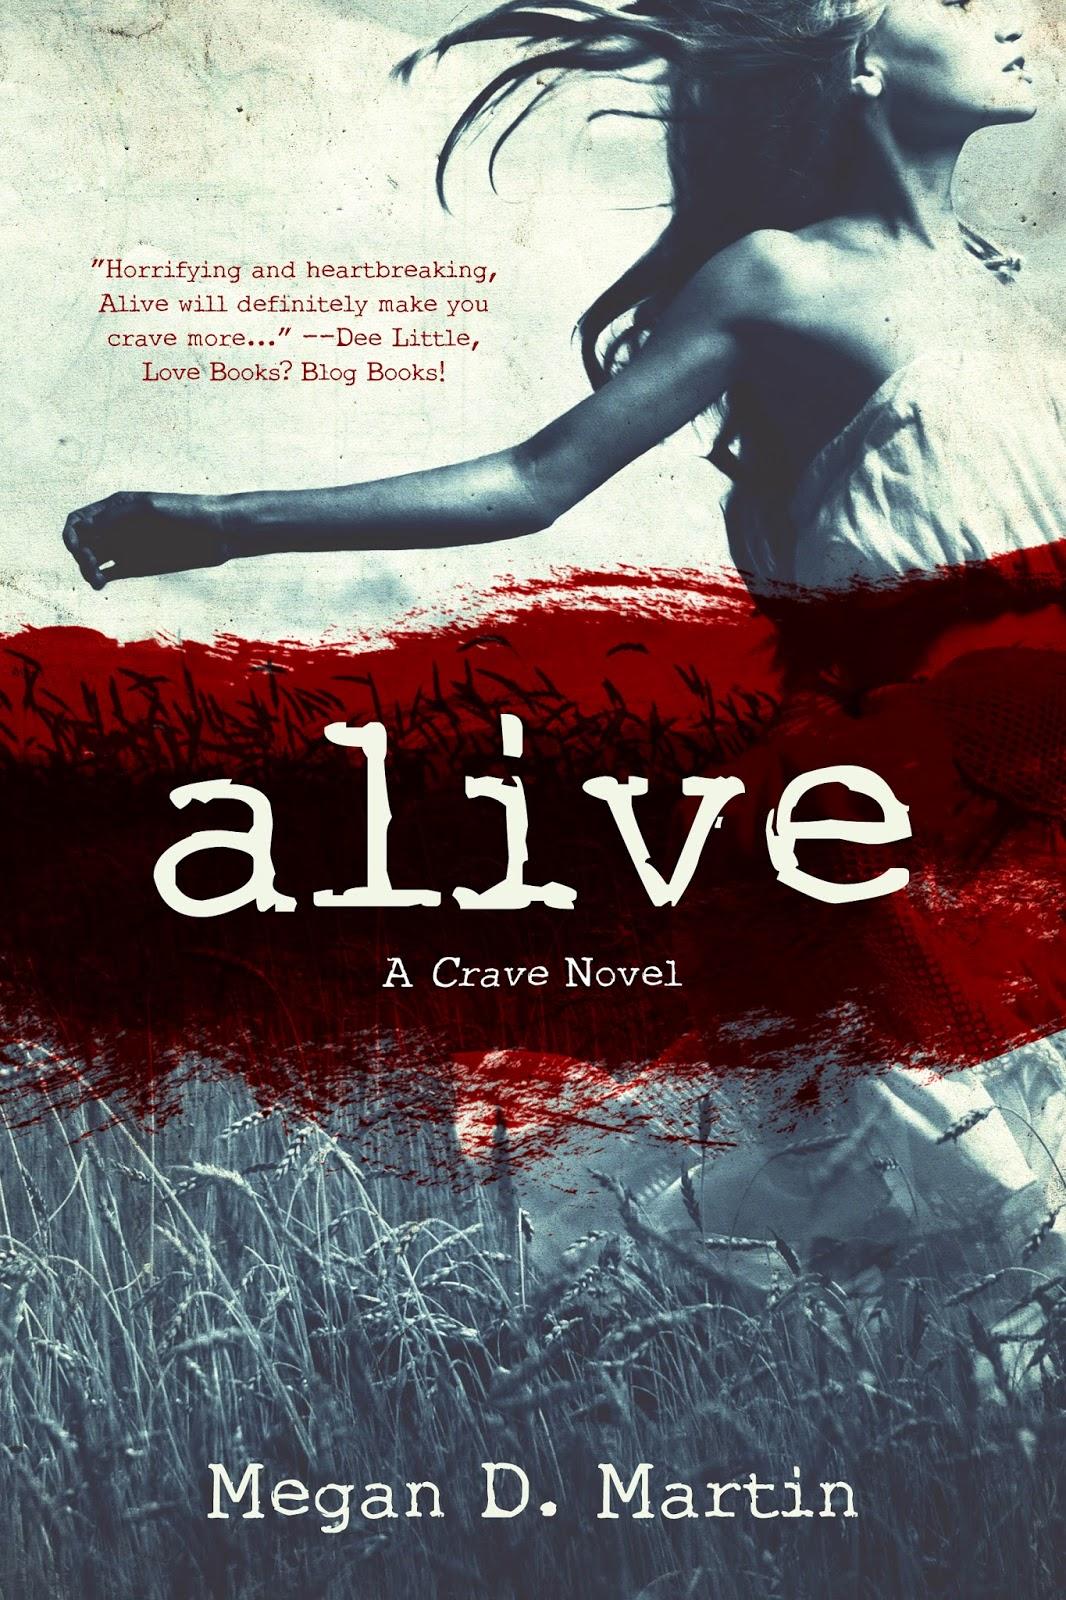 Book Blitz: Alive by Megan D. Martin *Giveaway*